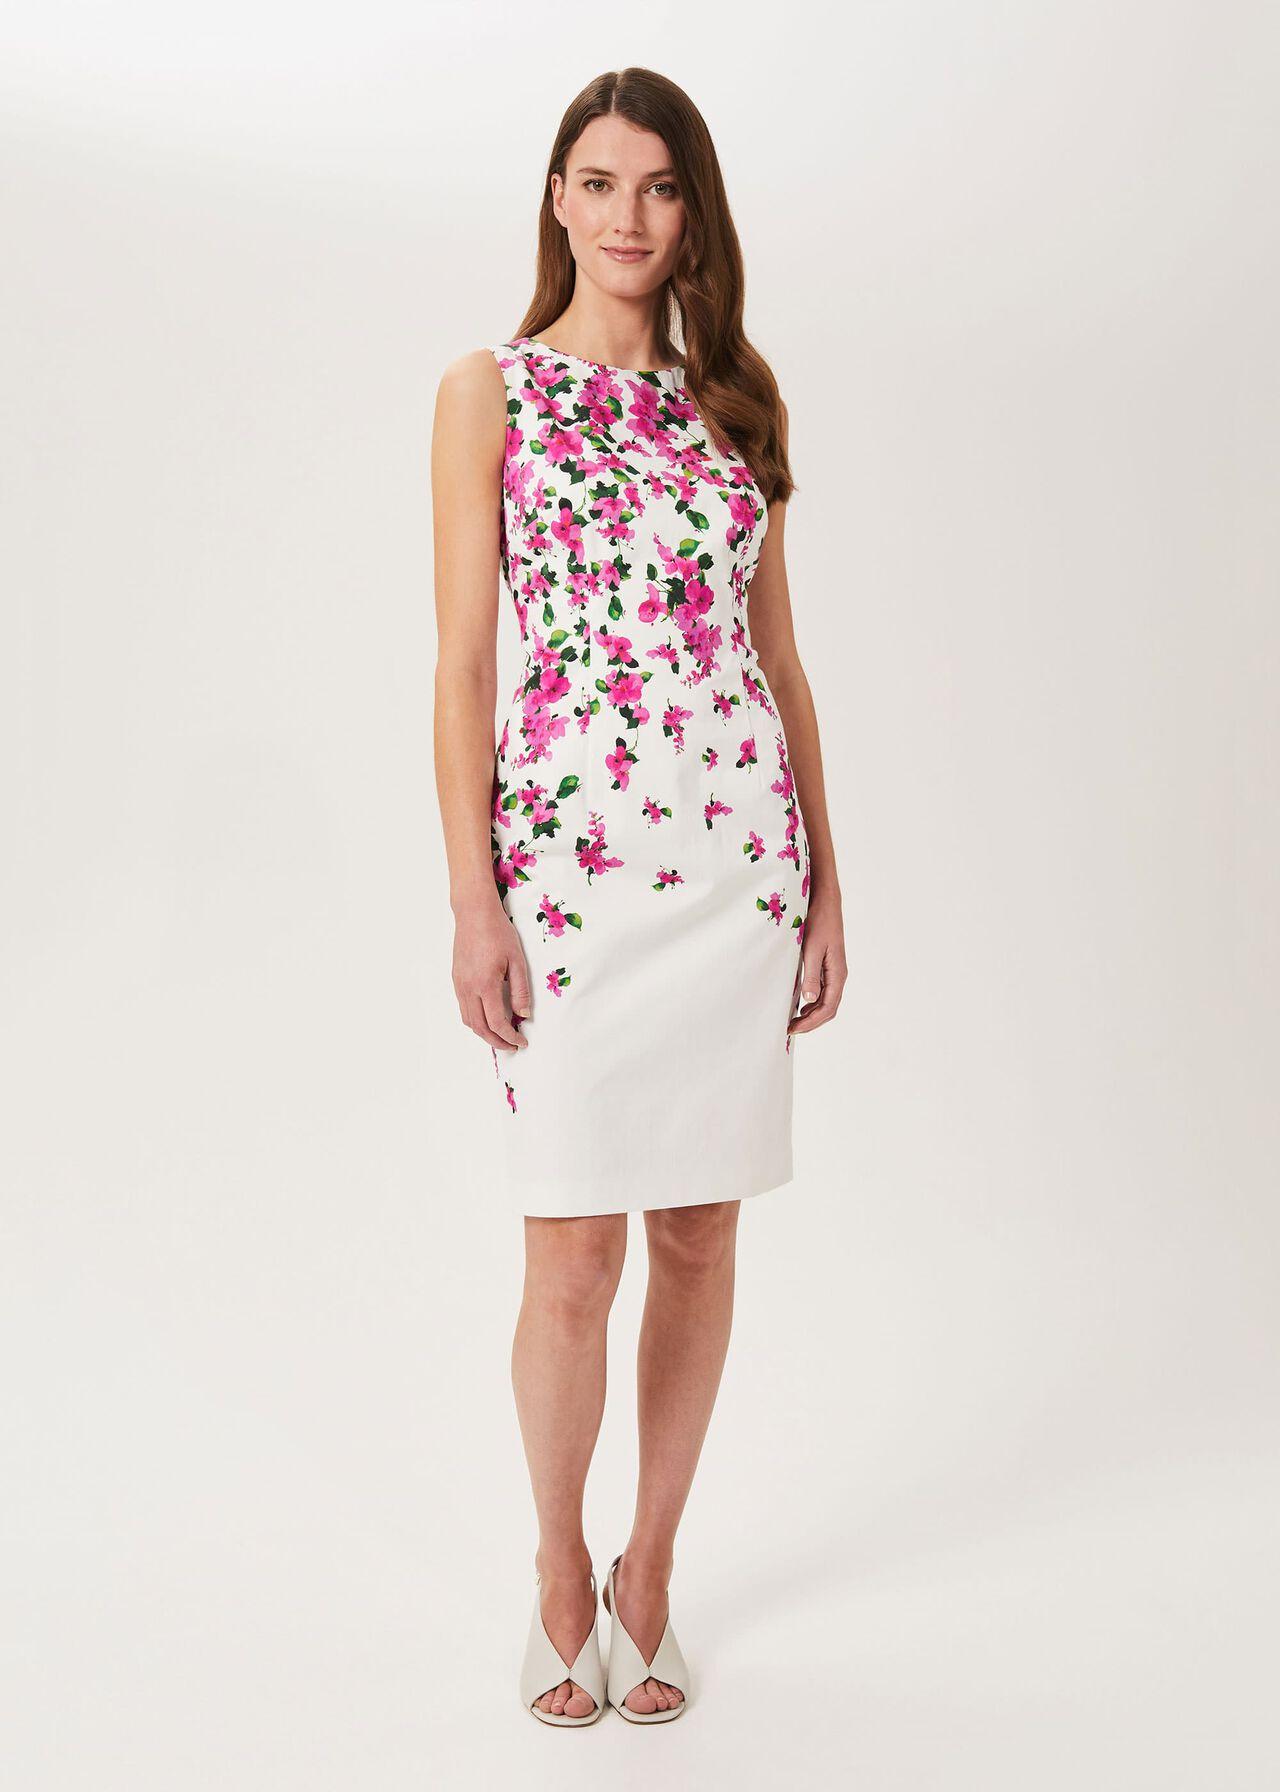 Fiona Cotton Blend Shift Dress, Ivory Fuchsia, hi-res